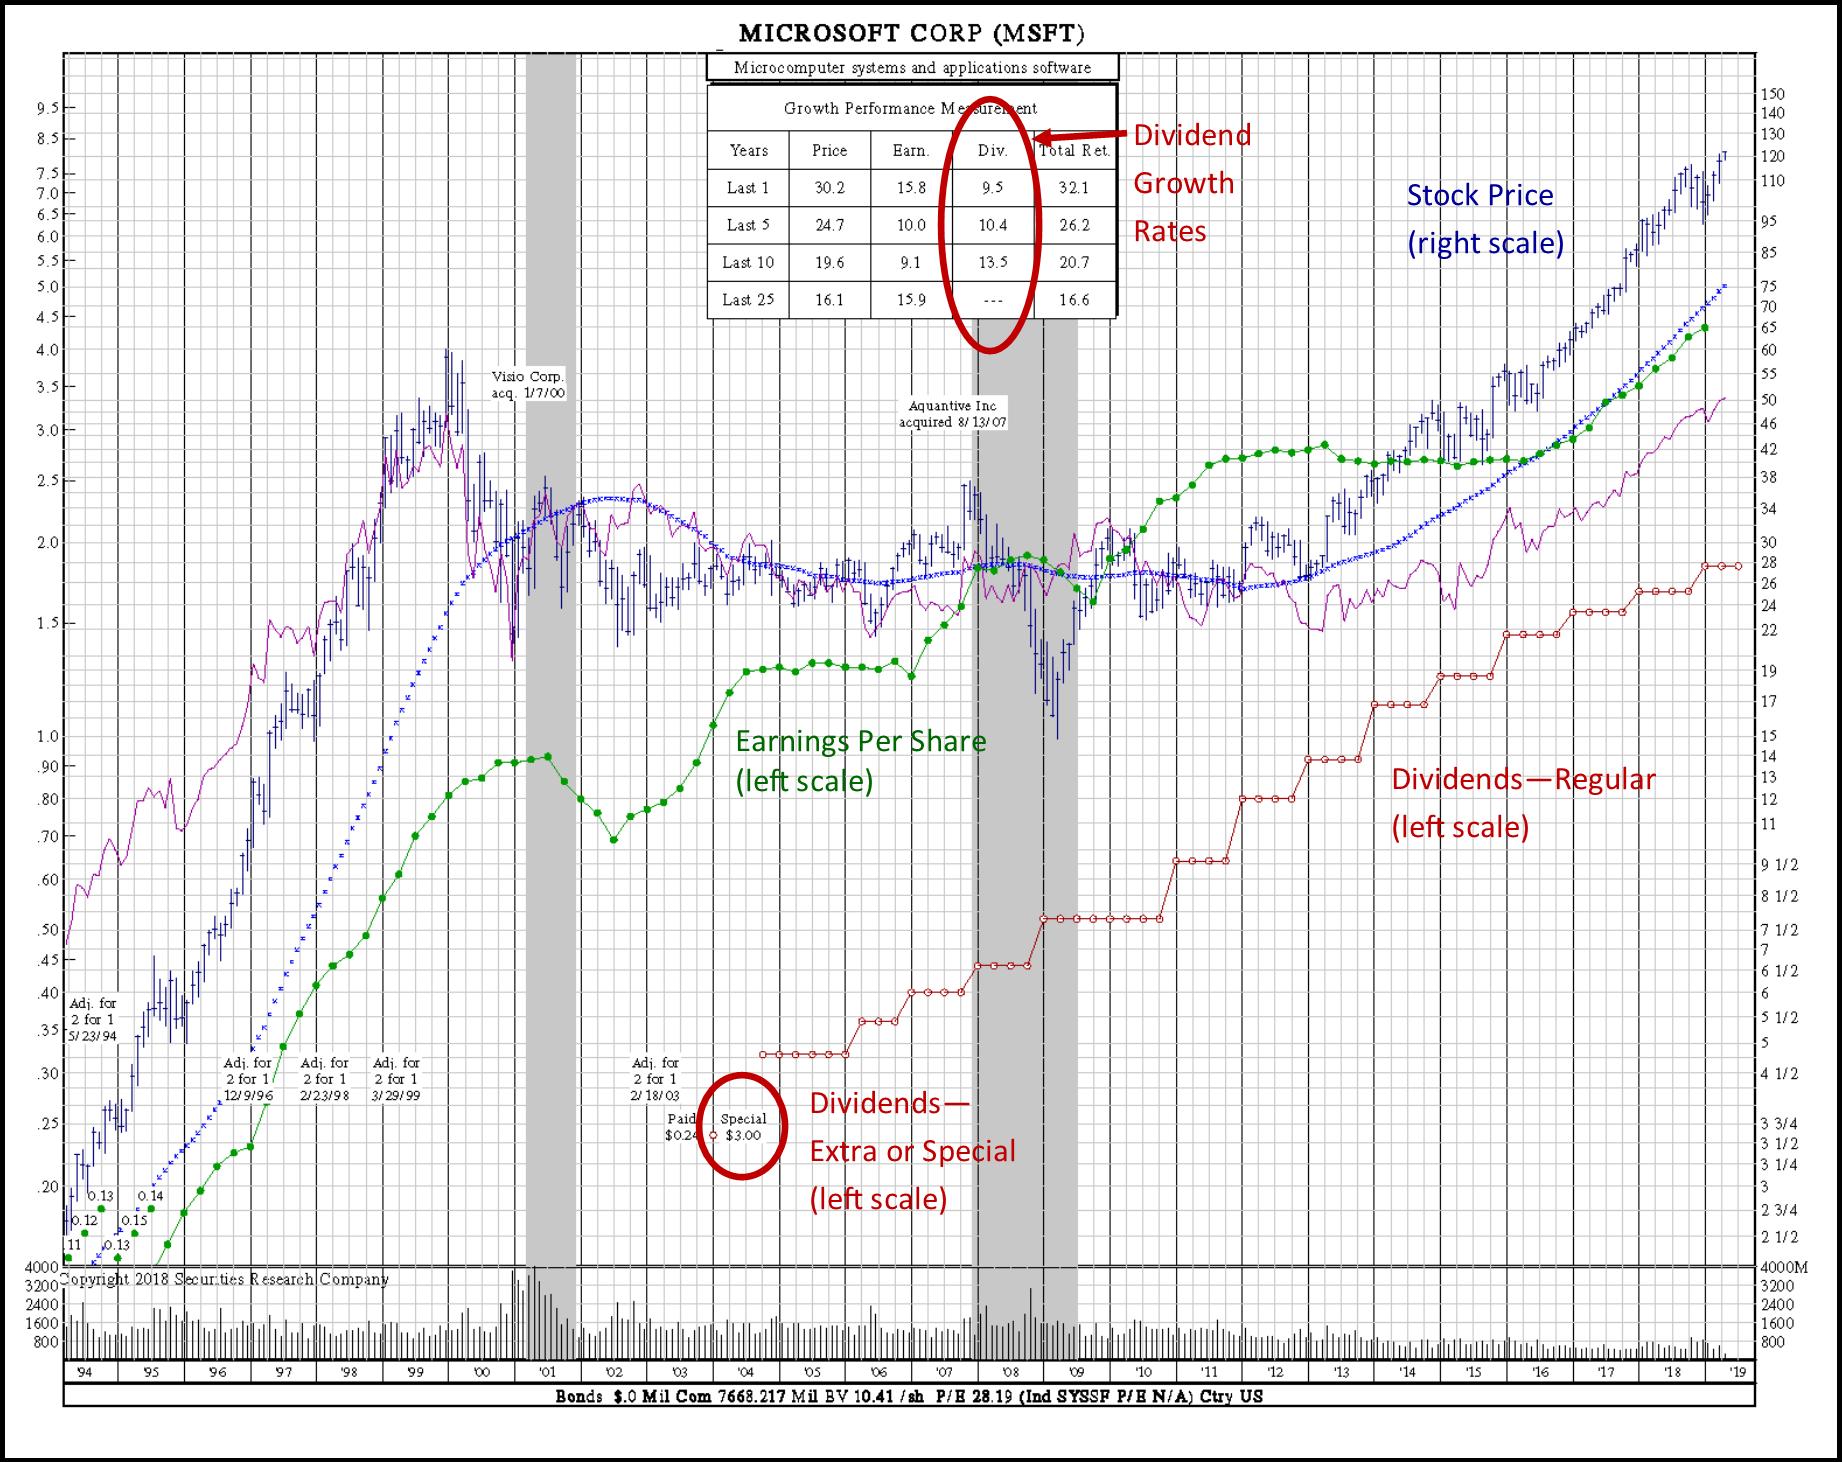 dividend stocks investing microsoft